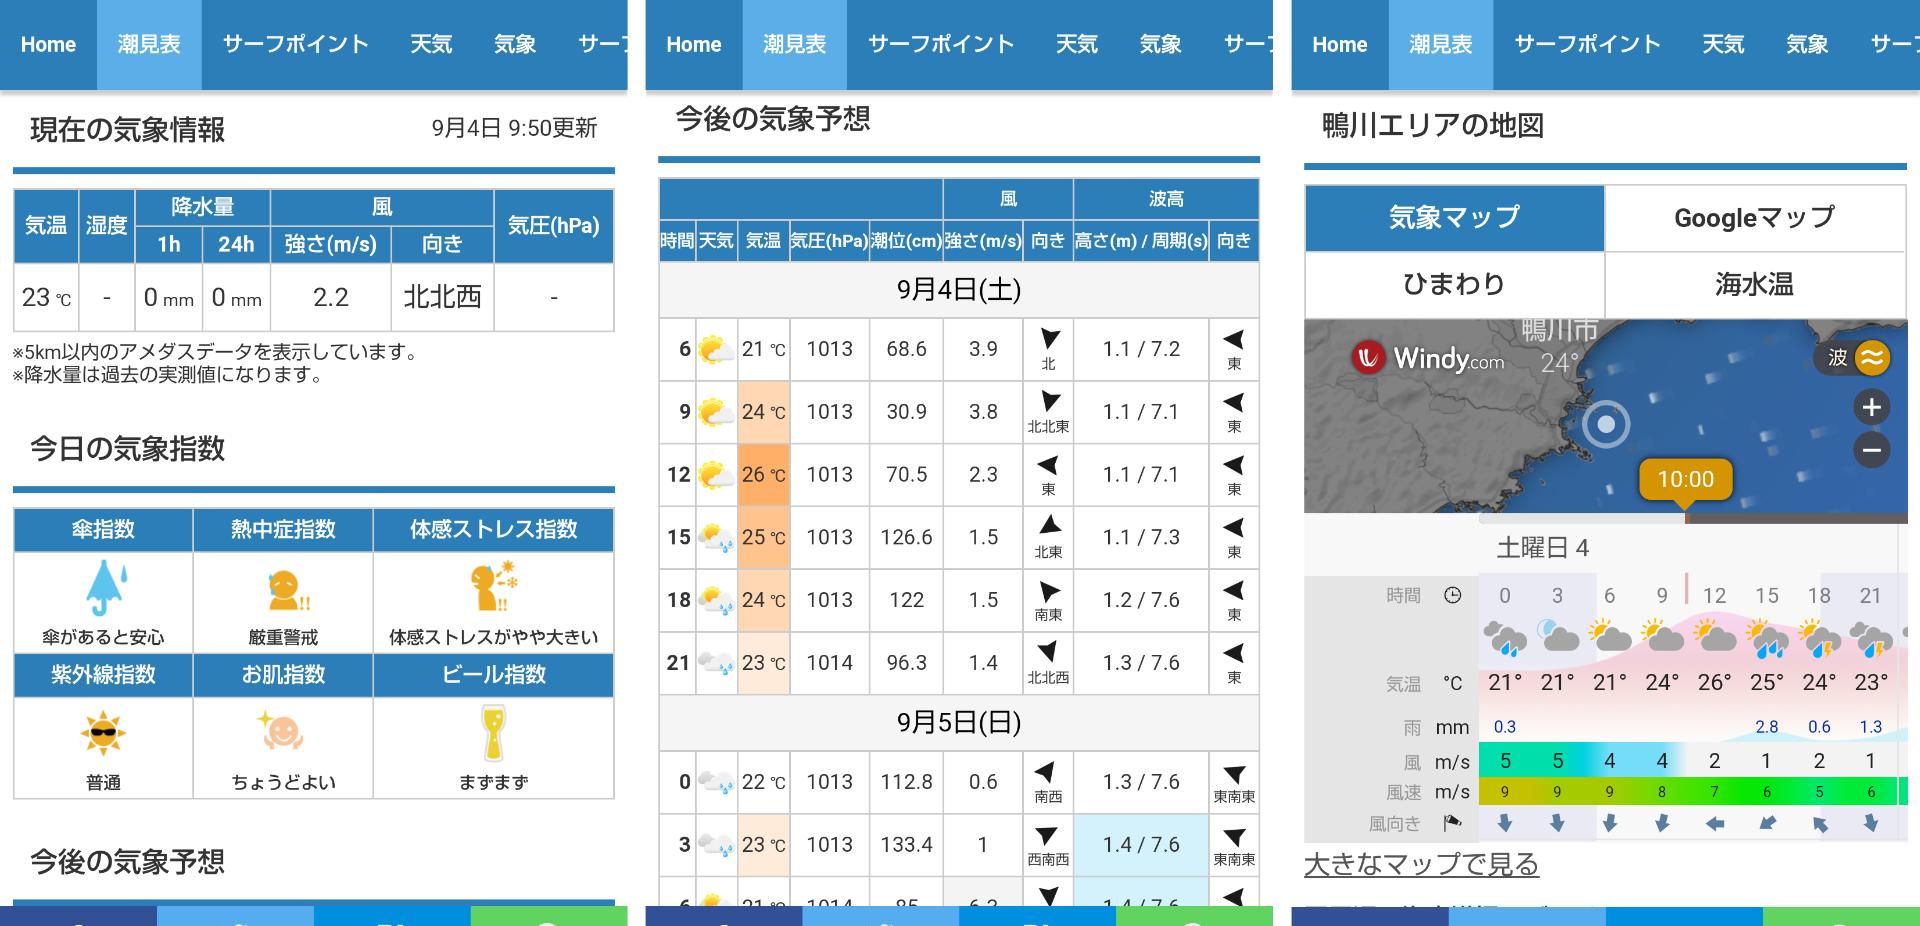 surf life 潮見表「気象情報、予想 各エリア地図(Windy)」